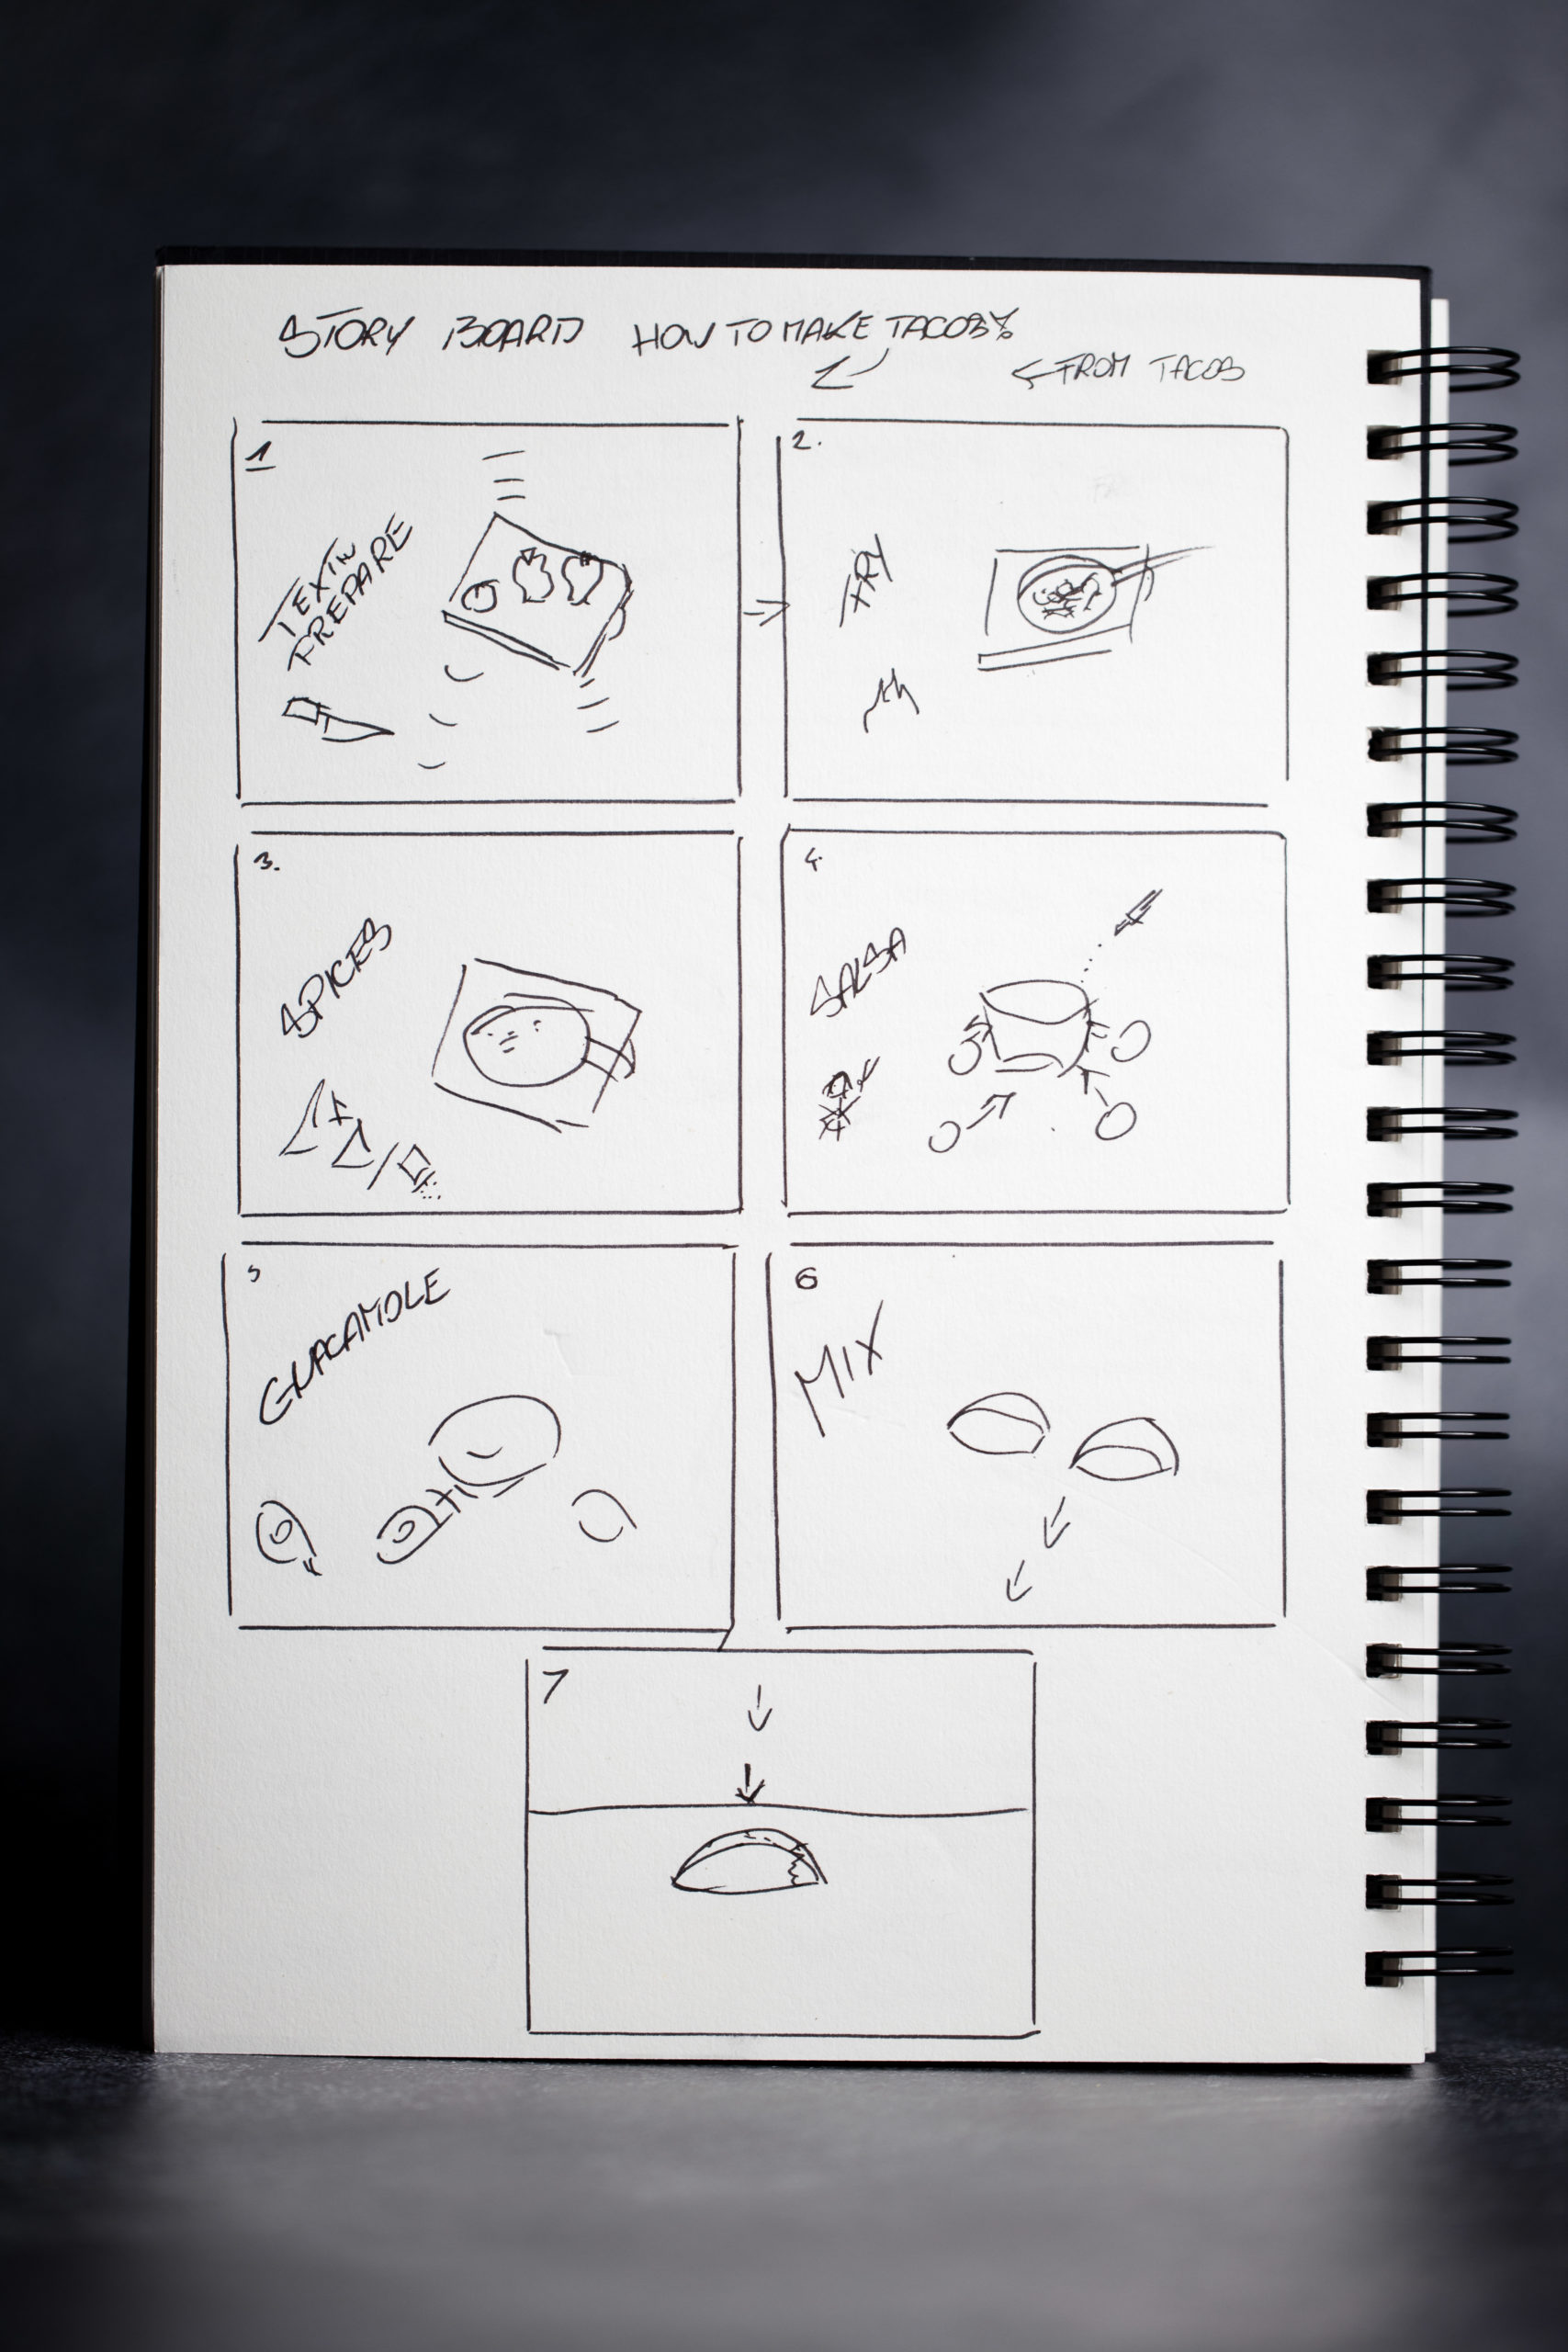 Storyboard How to make Stop-motion tacos video? Krystian Krzewinski